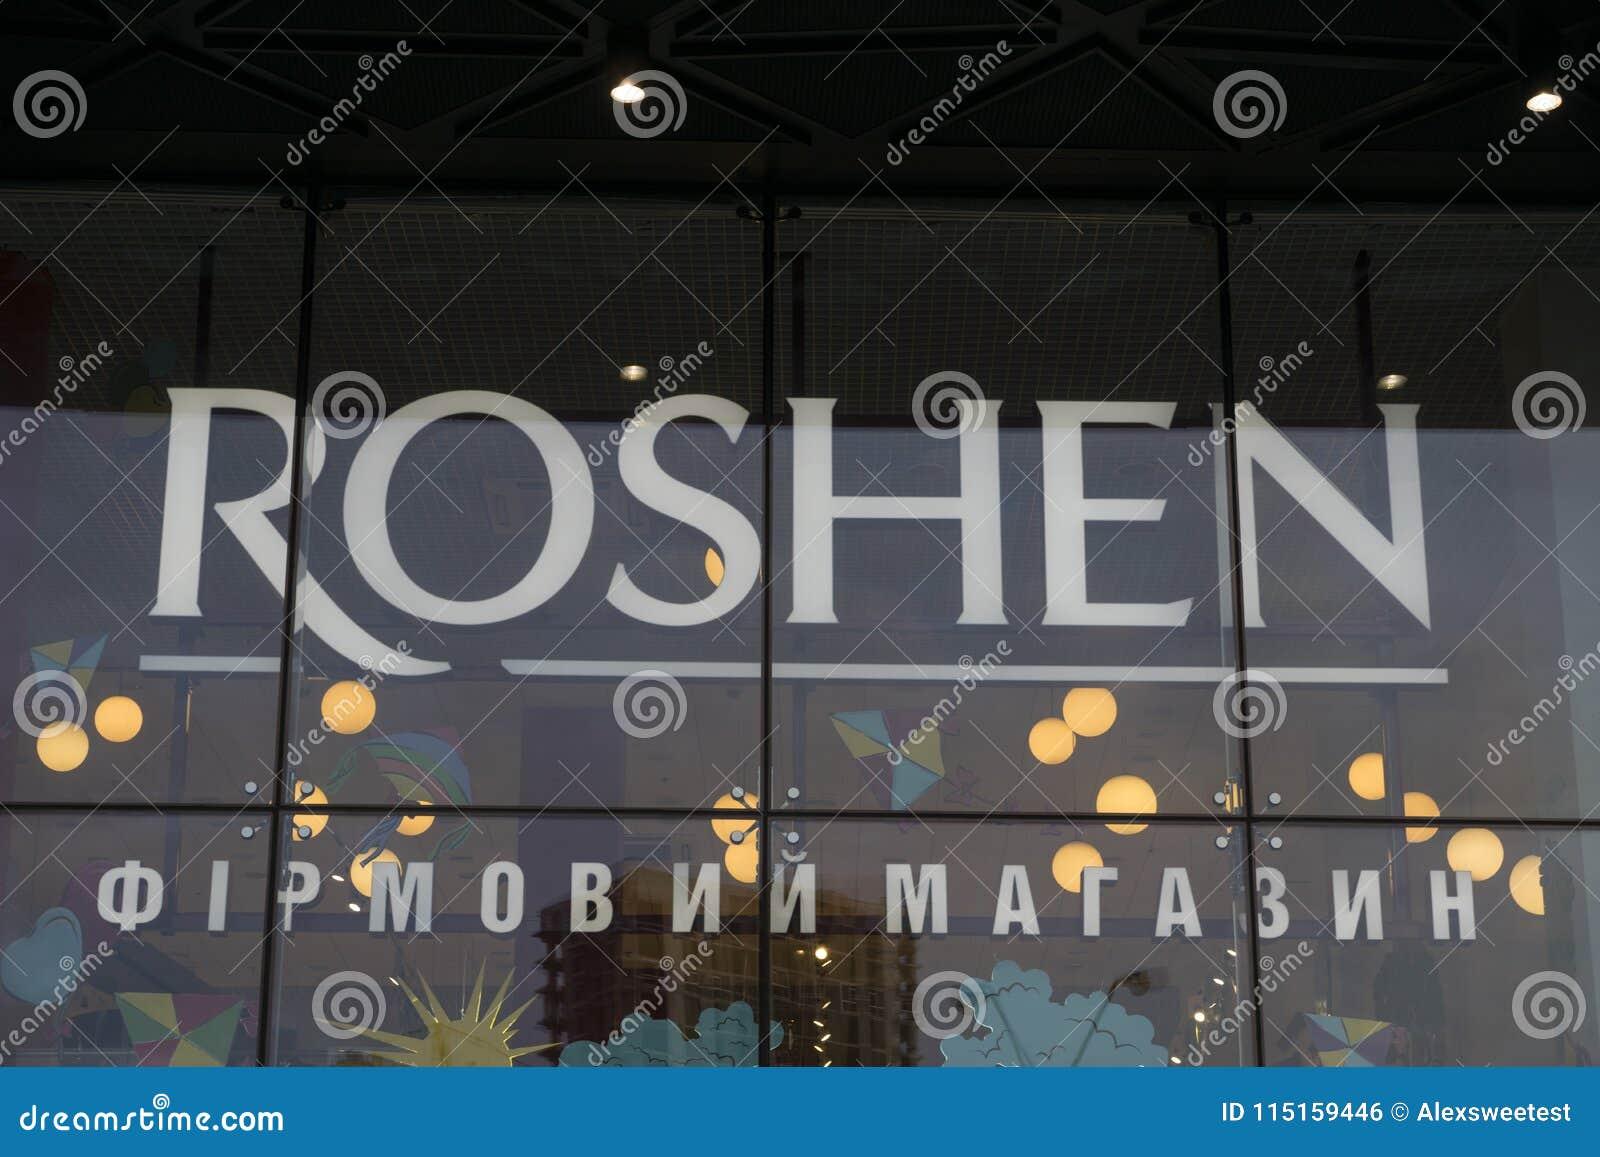 Магазин Roshen кондитерскаи